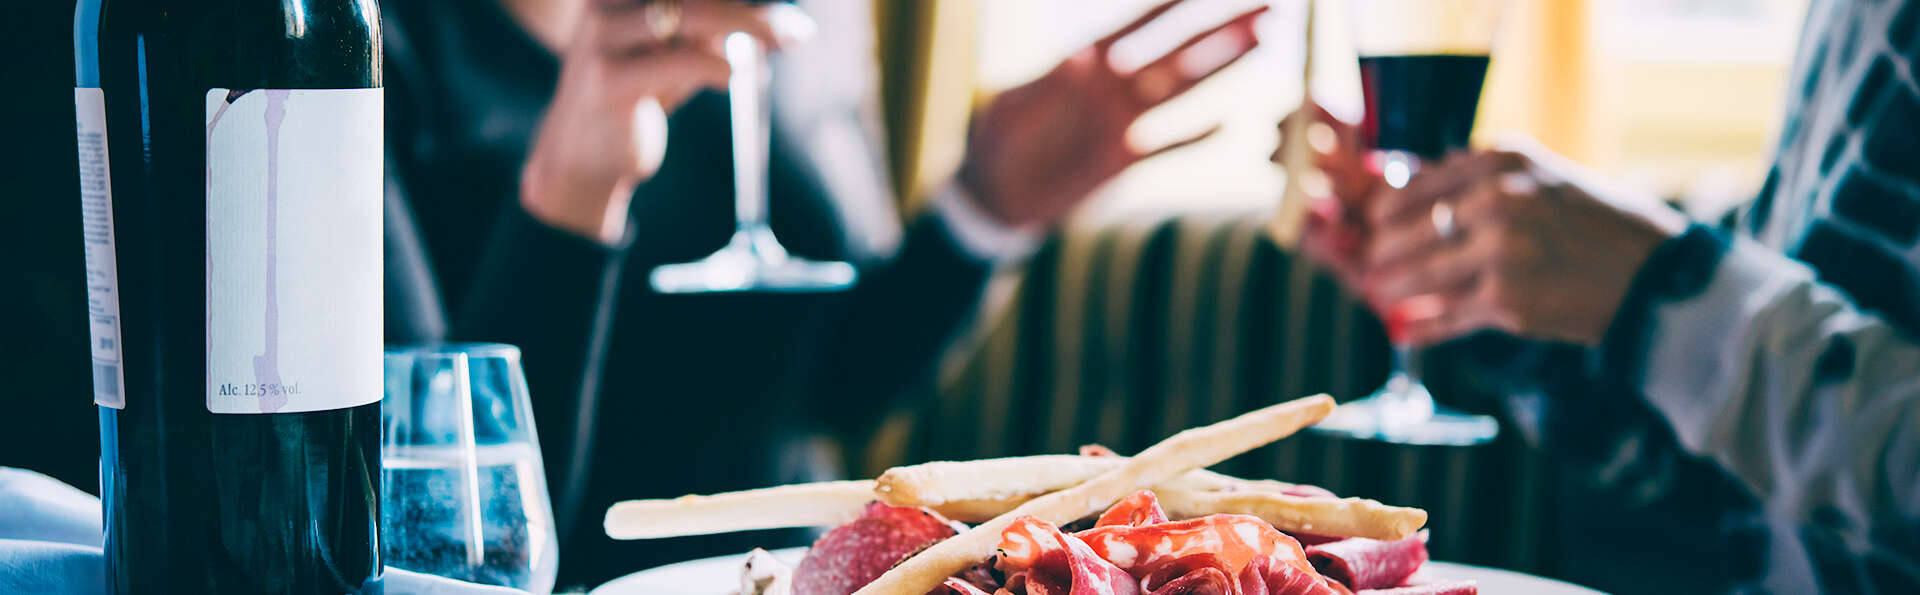 Séjour avec dîner à Abano Terme